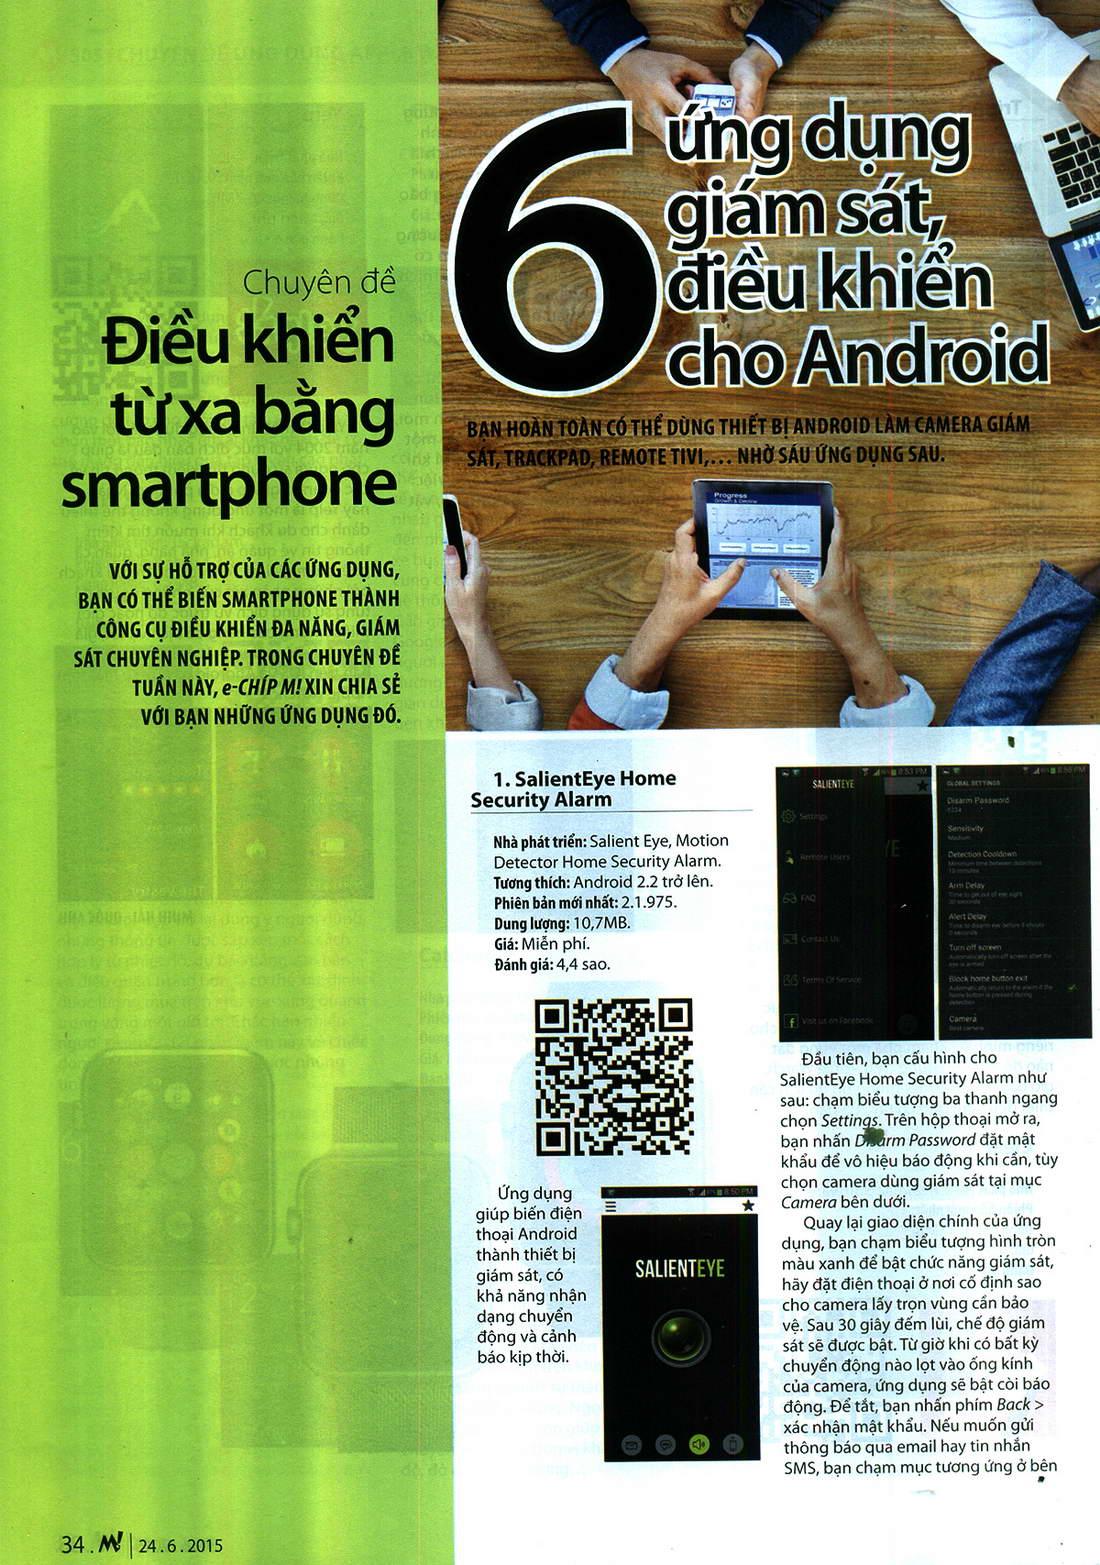 EChip Mobile 505 tapchicntt.com